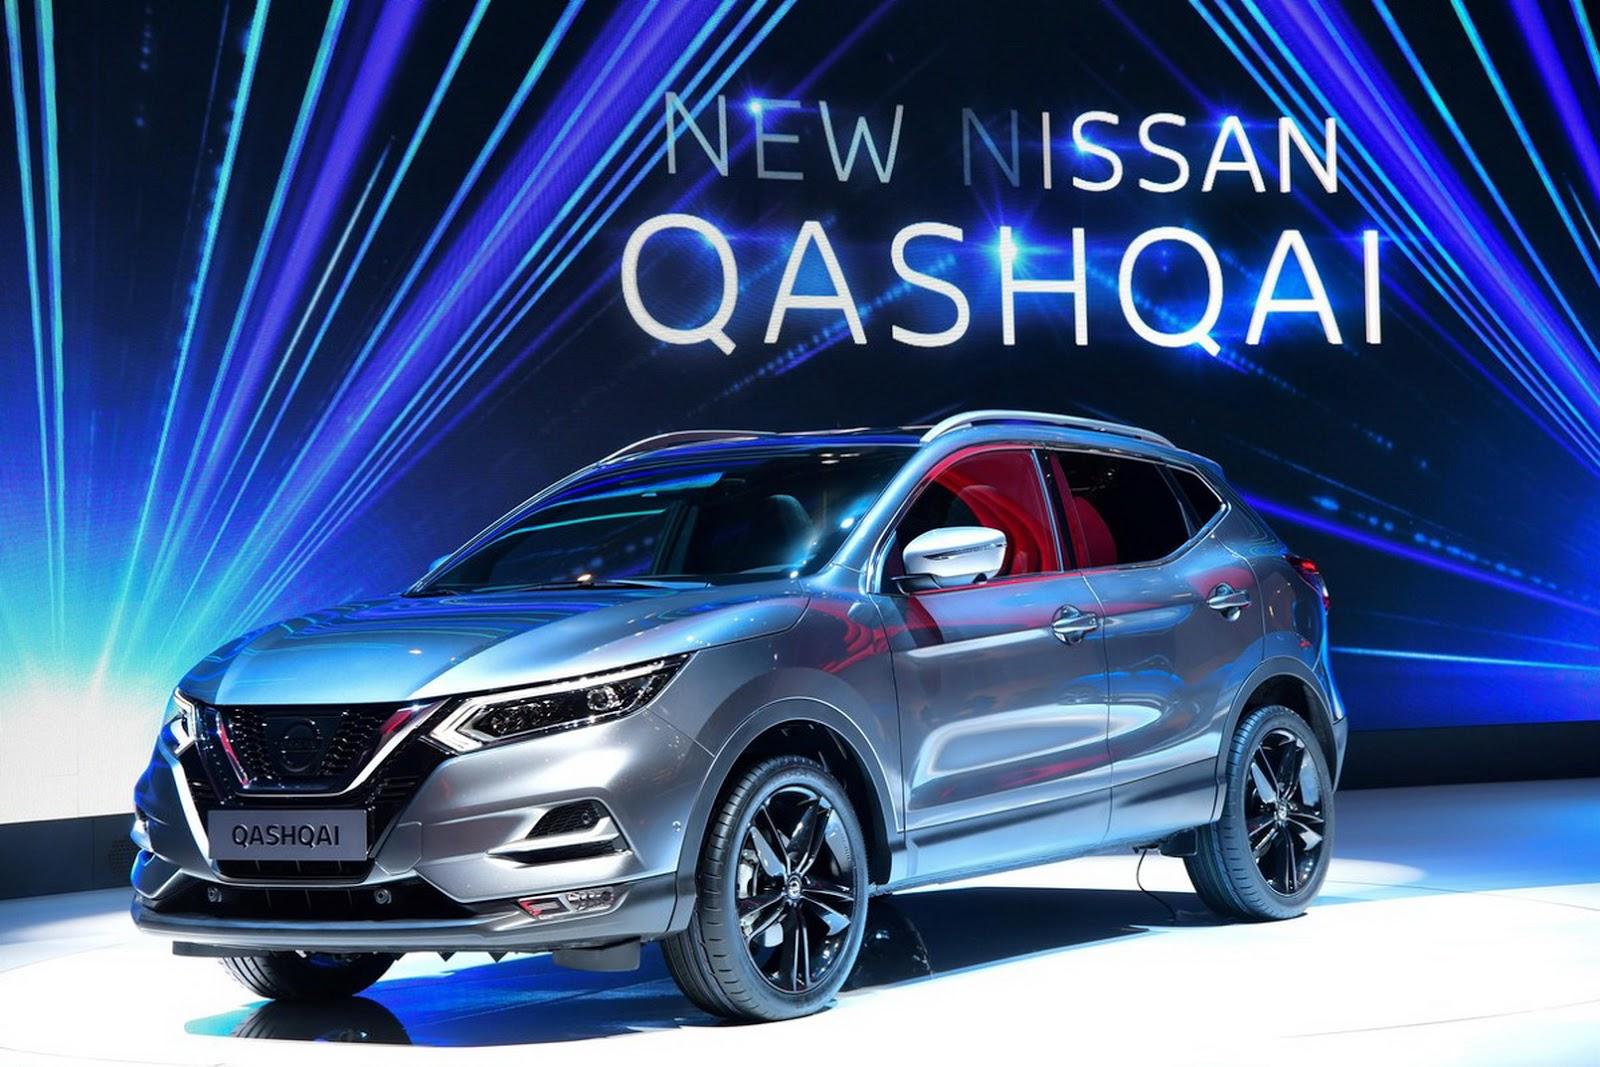 Nowy wizerunek - Nissan Qashqai 2018